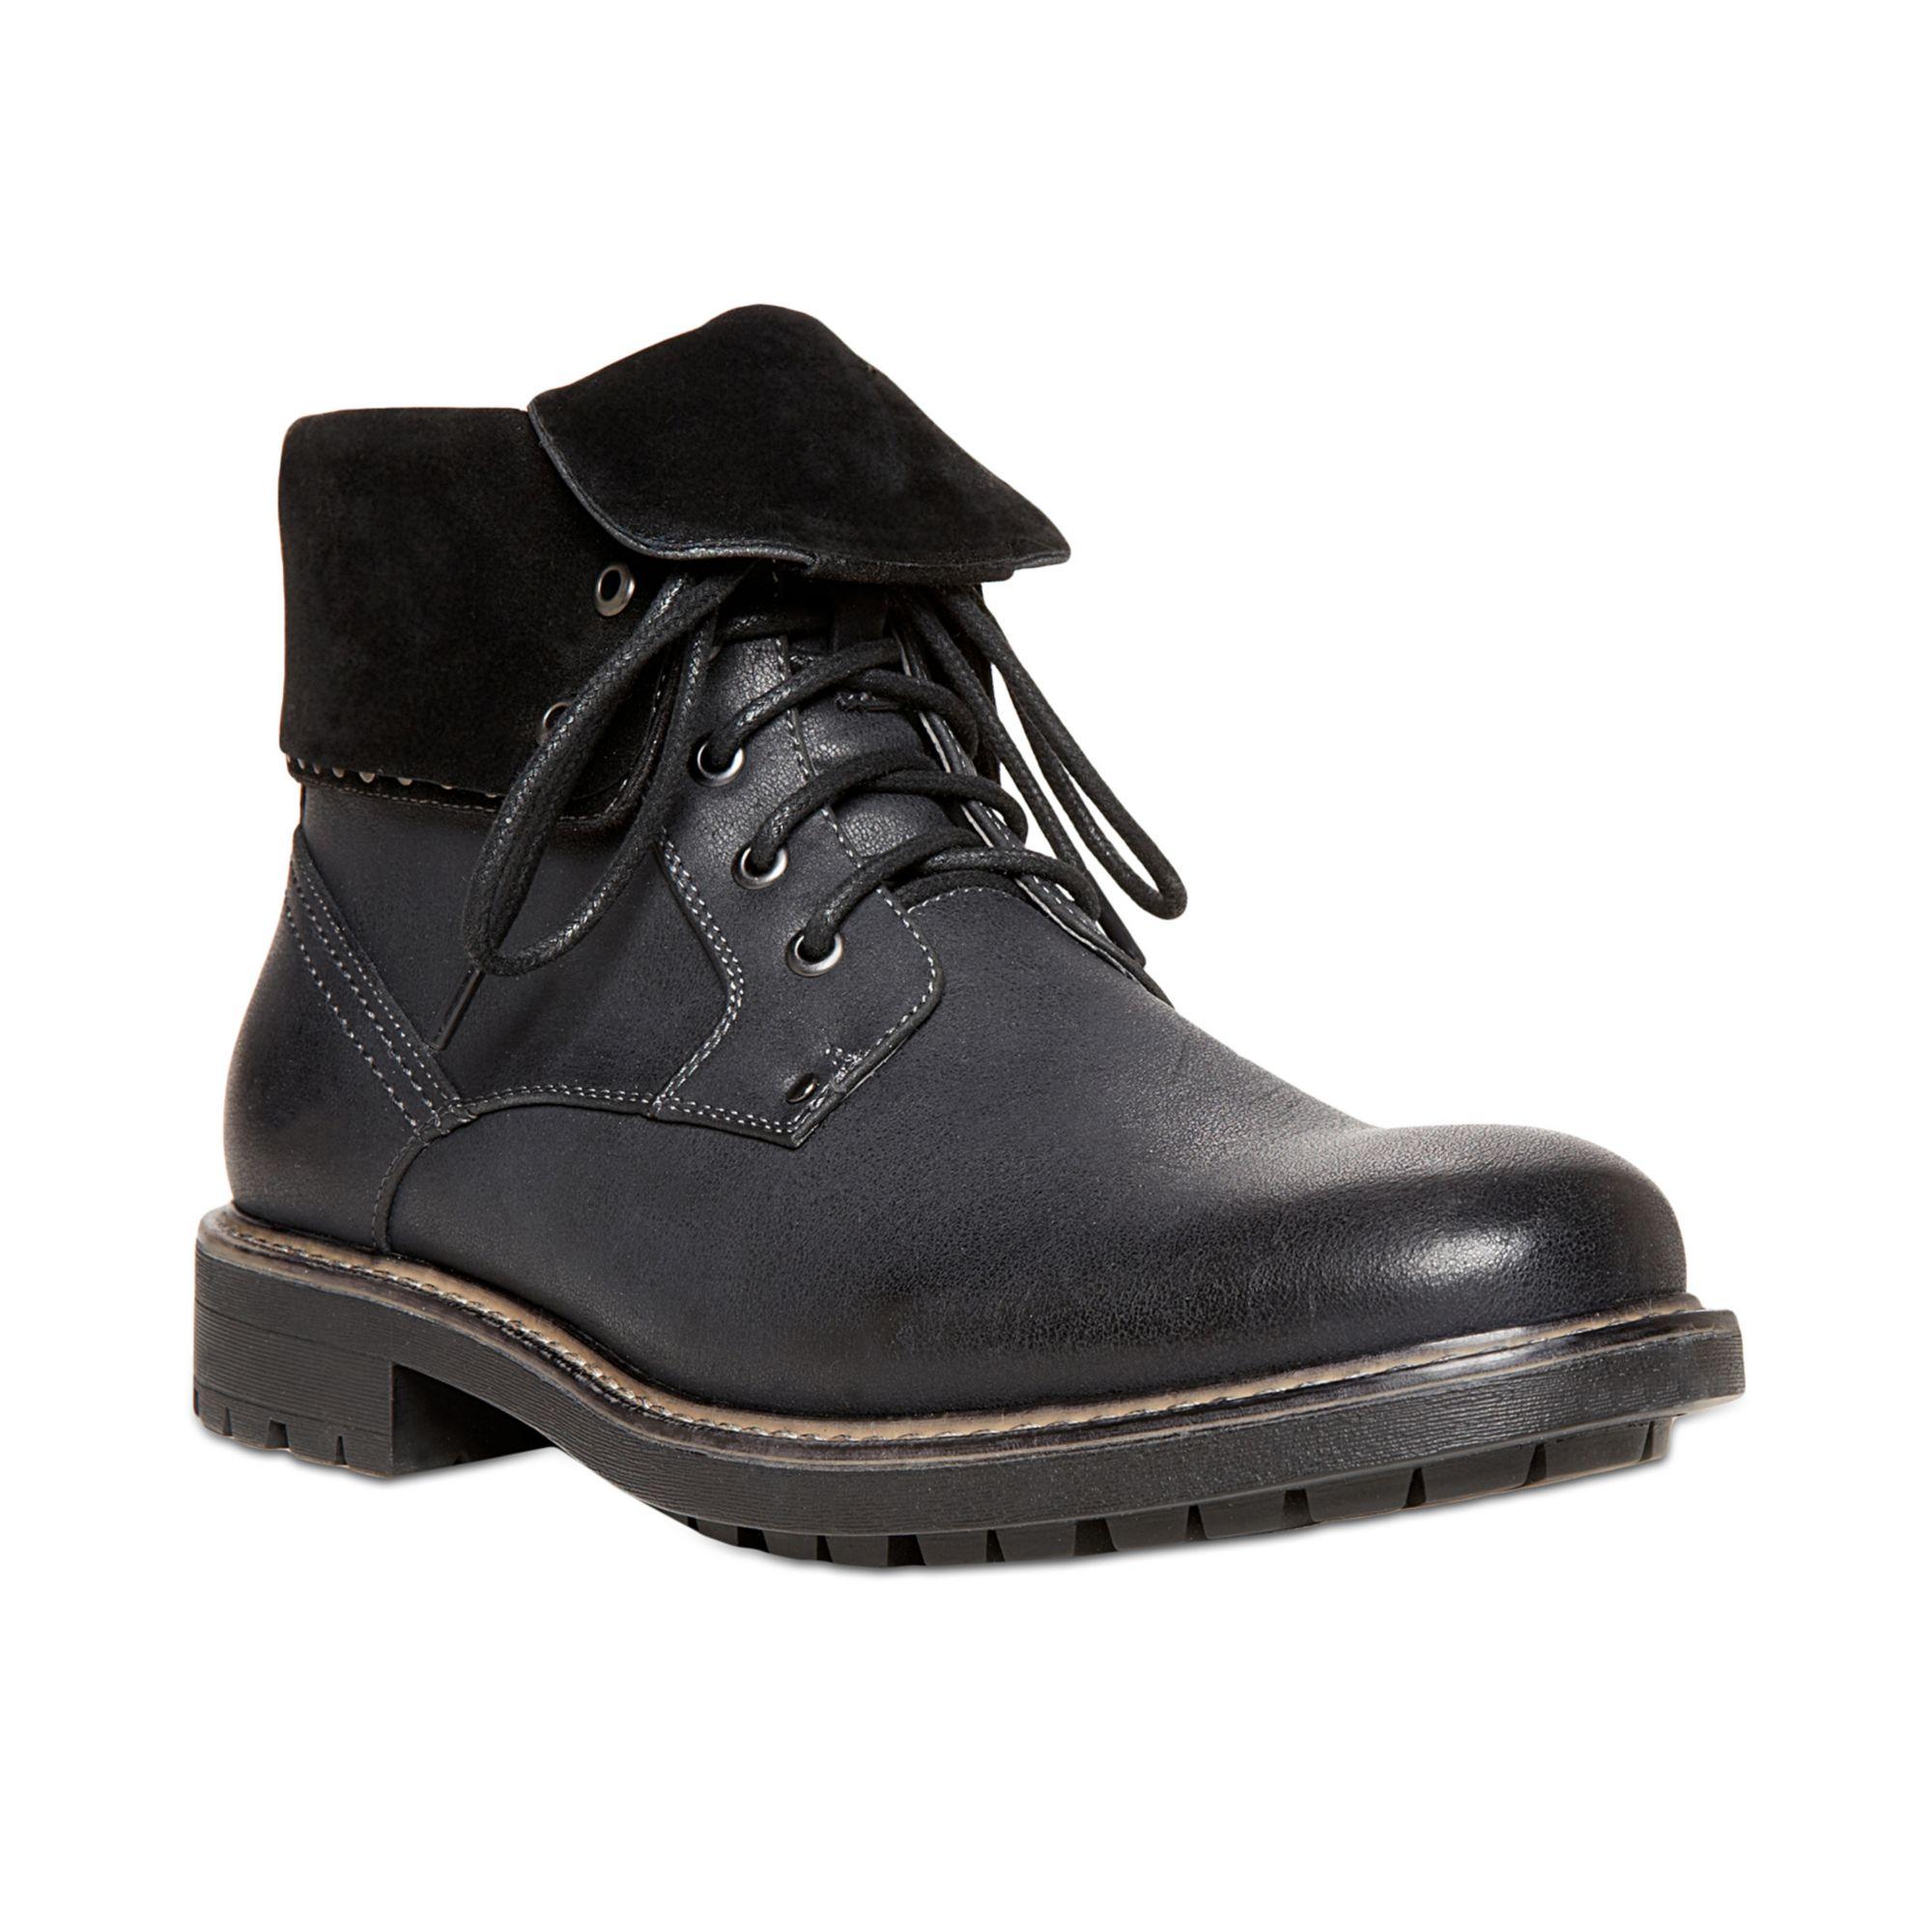 Steve Madden Mens Black Shoes